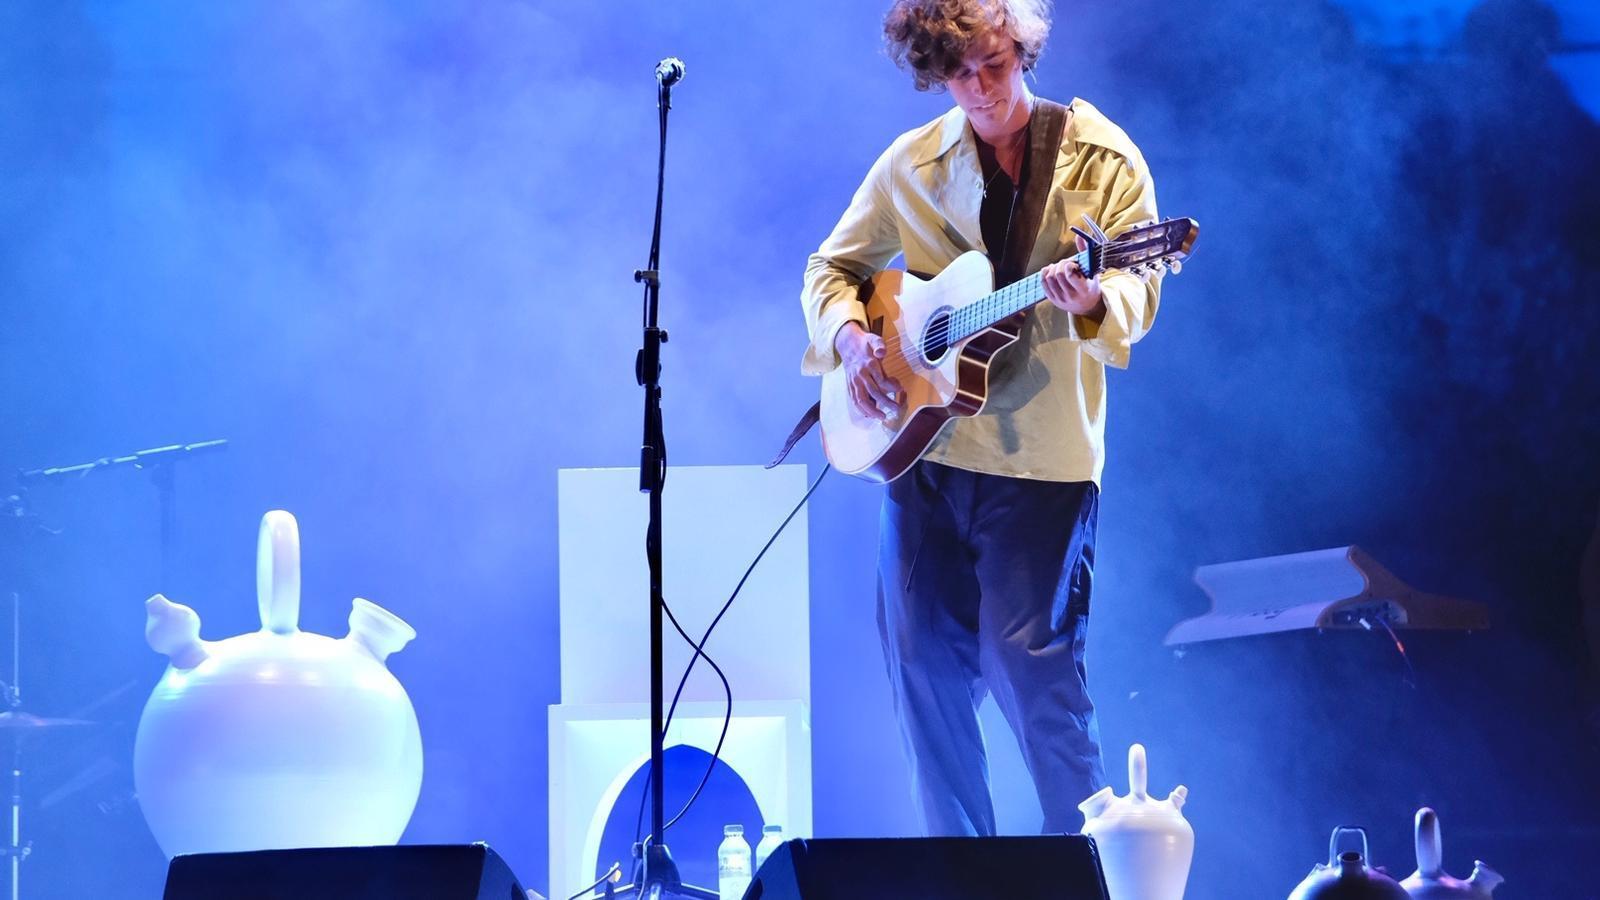 Guitarricadelafuente durant el concert al Fes Pedralbes.